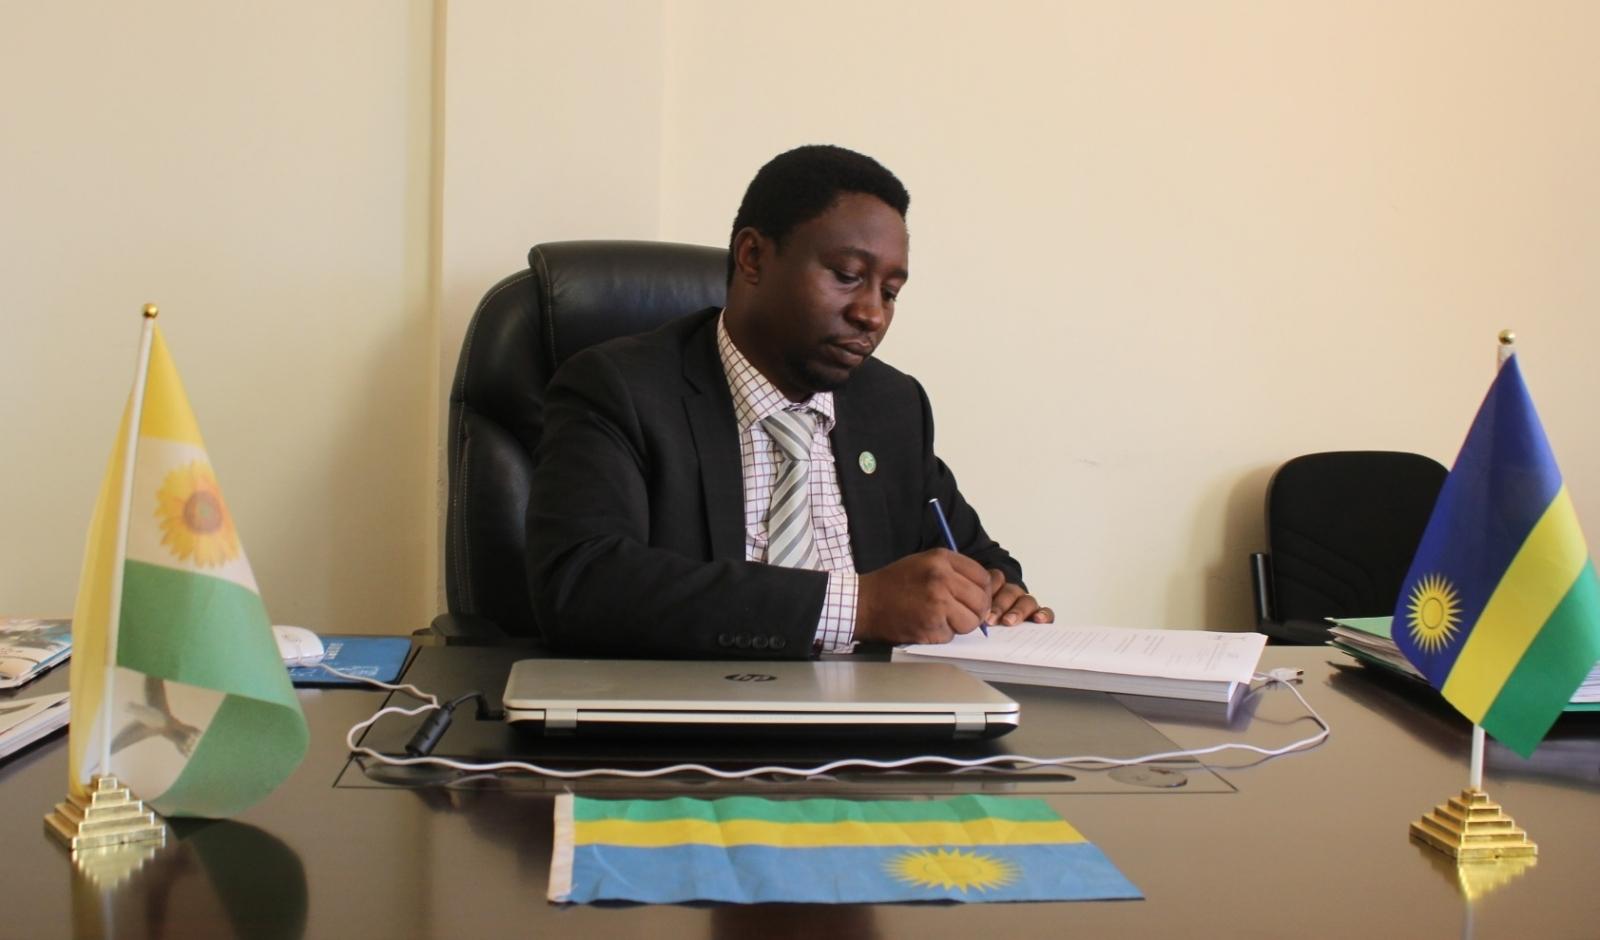 Rwandan opposition leader Frank Habineza